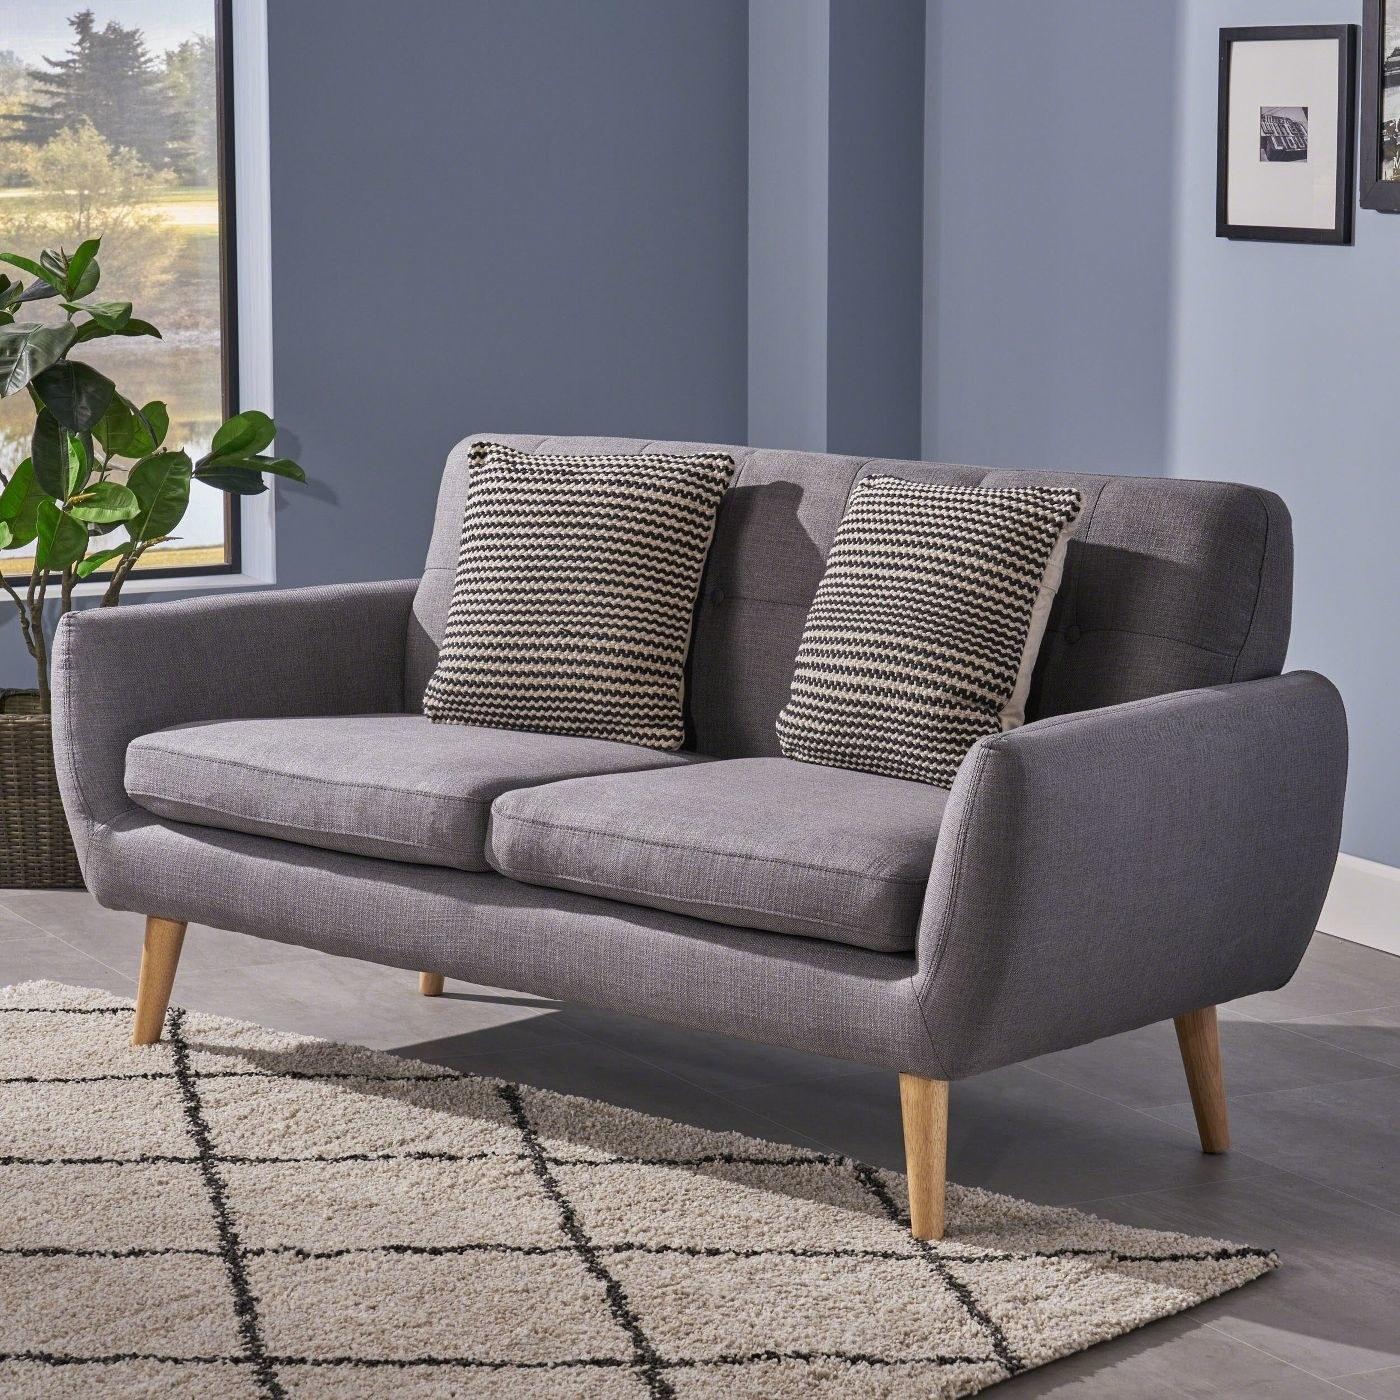 grey mid-century modern sofa with wooden legs